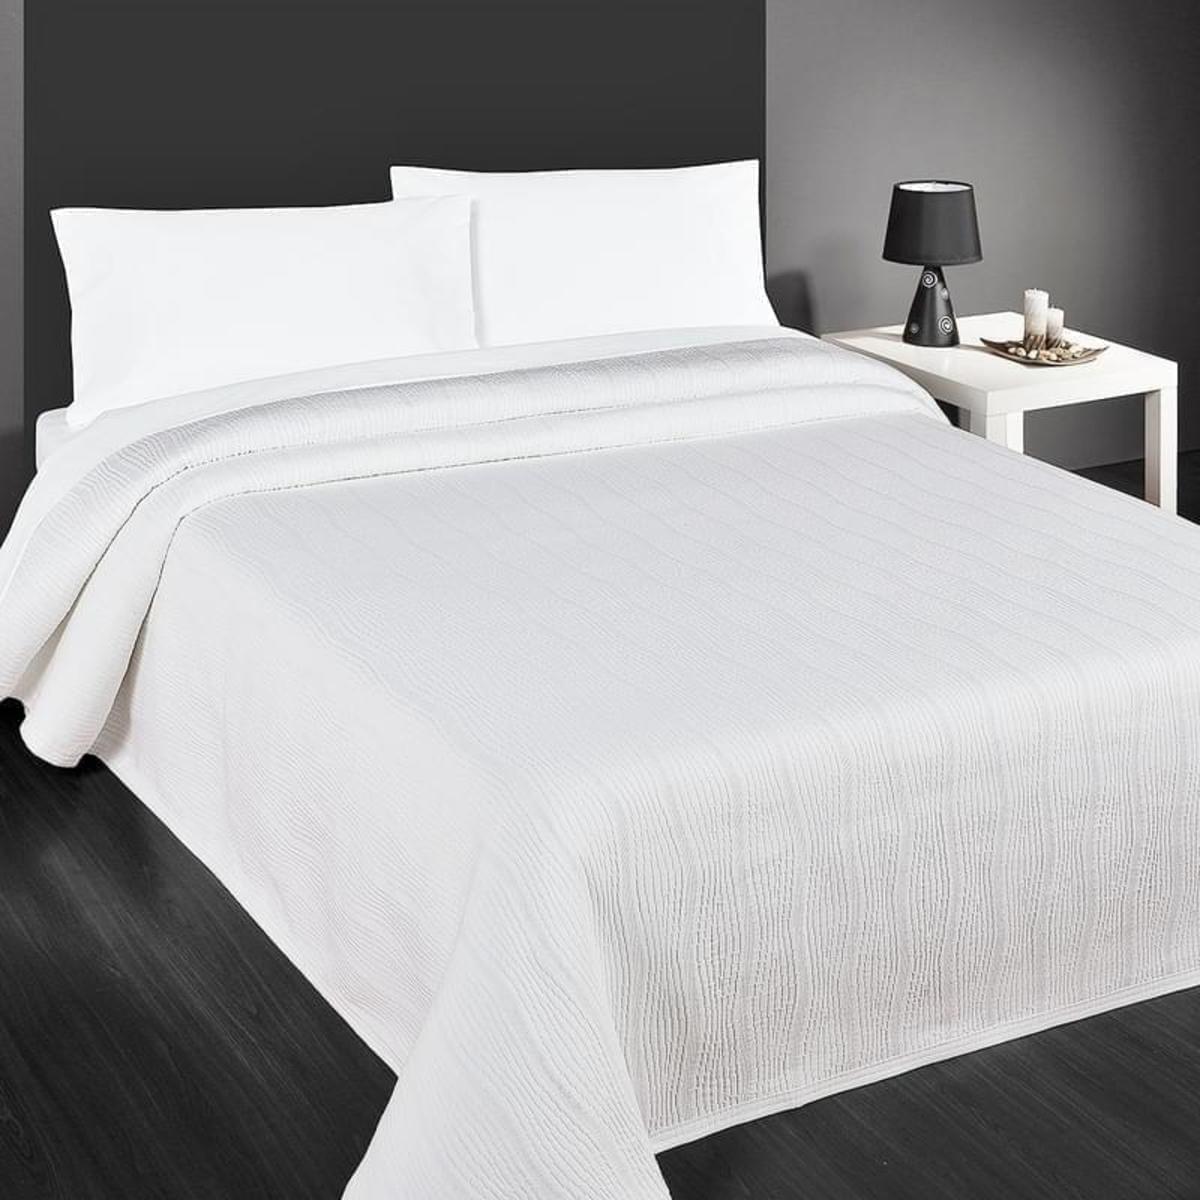 Forbyt Přehoz na postel, Capri, bílá 140 x 220 cm